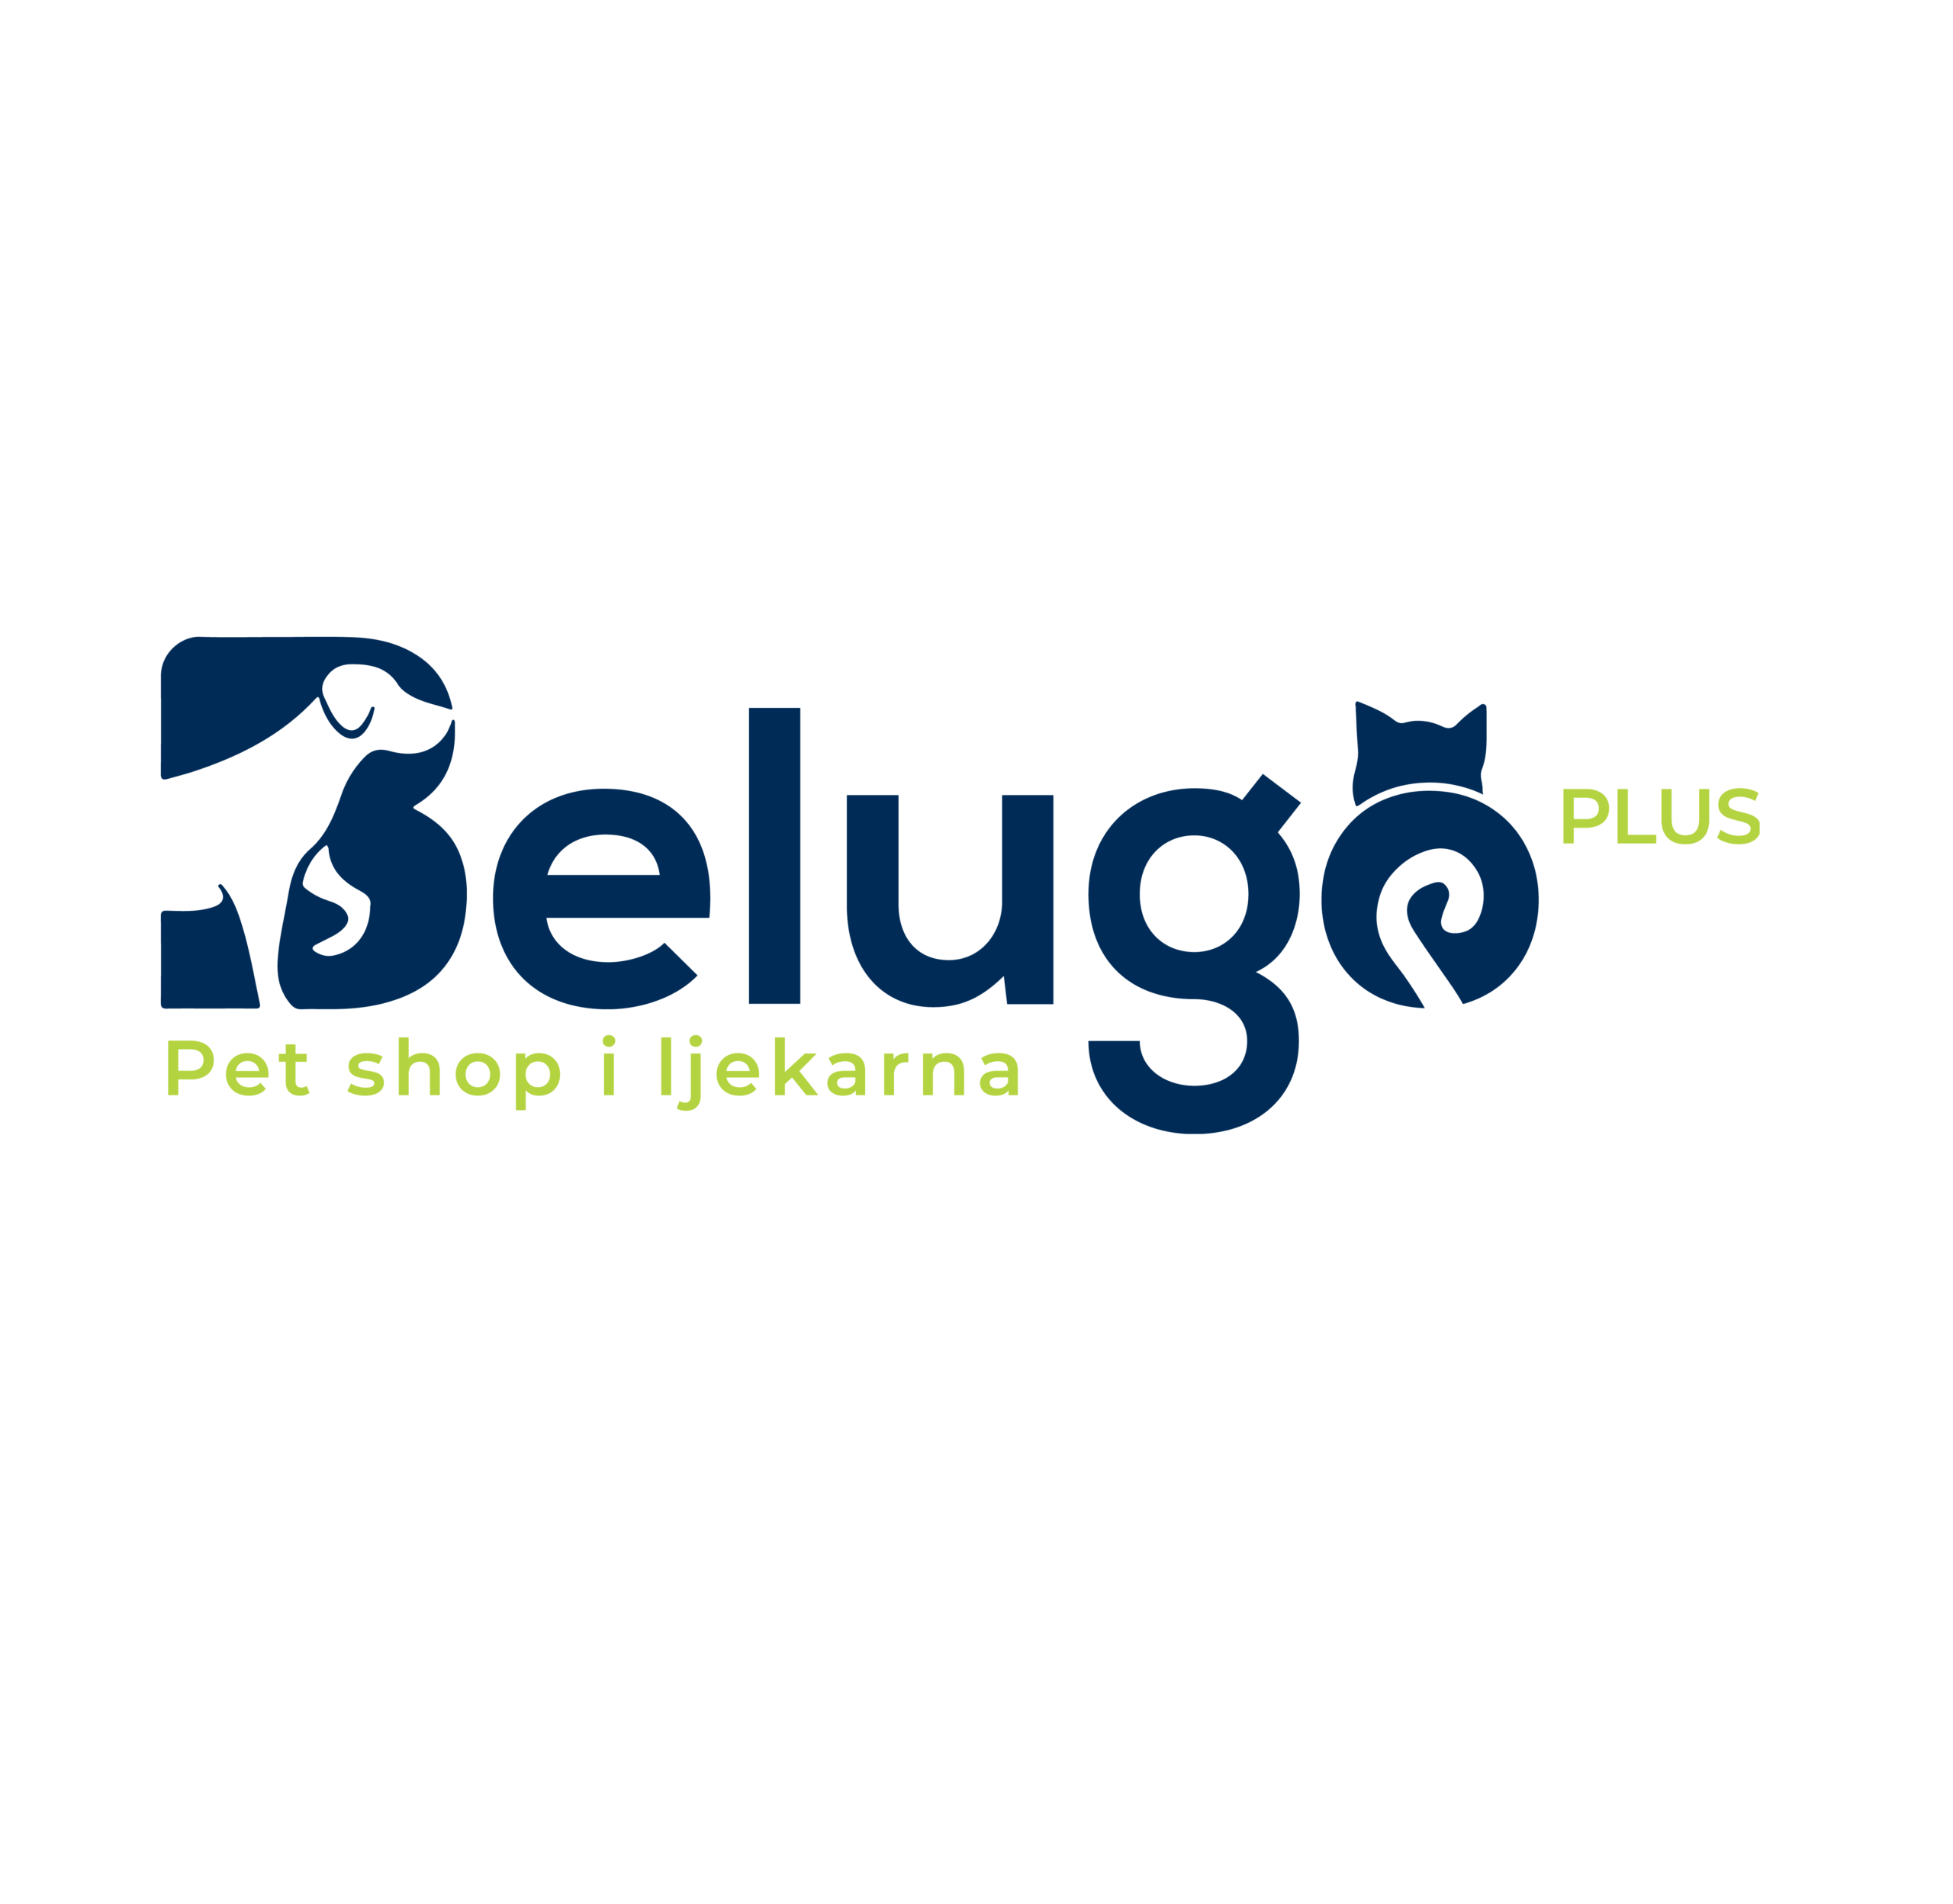 Nova poslovnica Pet shop Belugo Plus